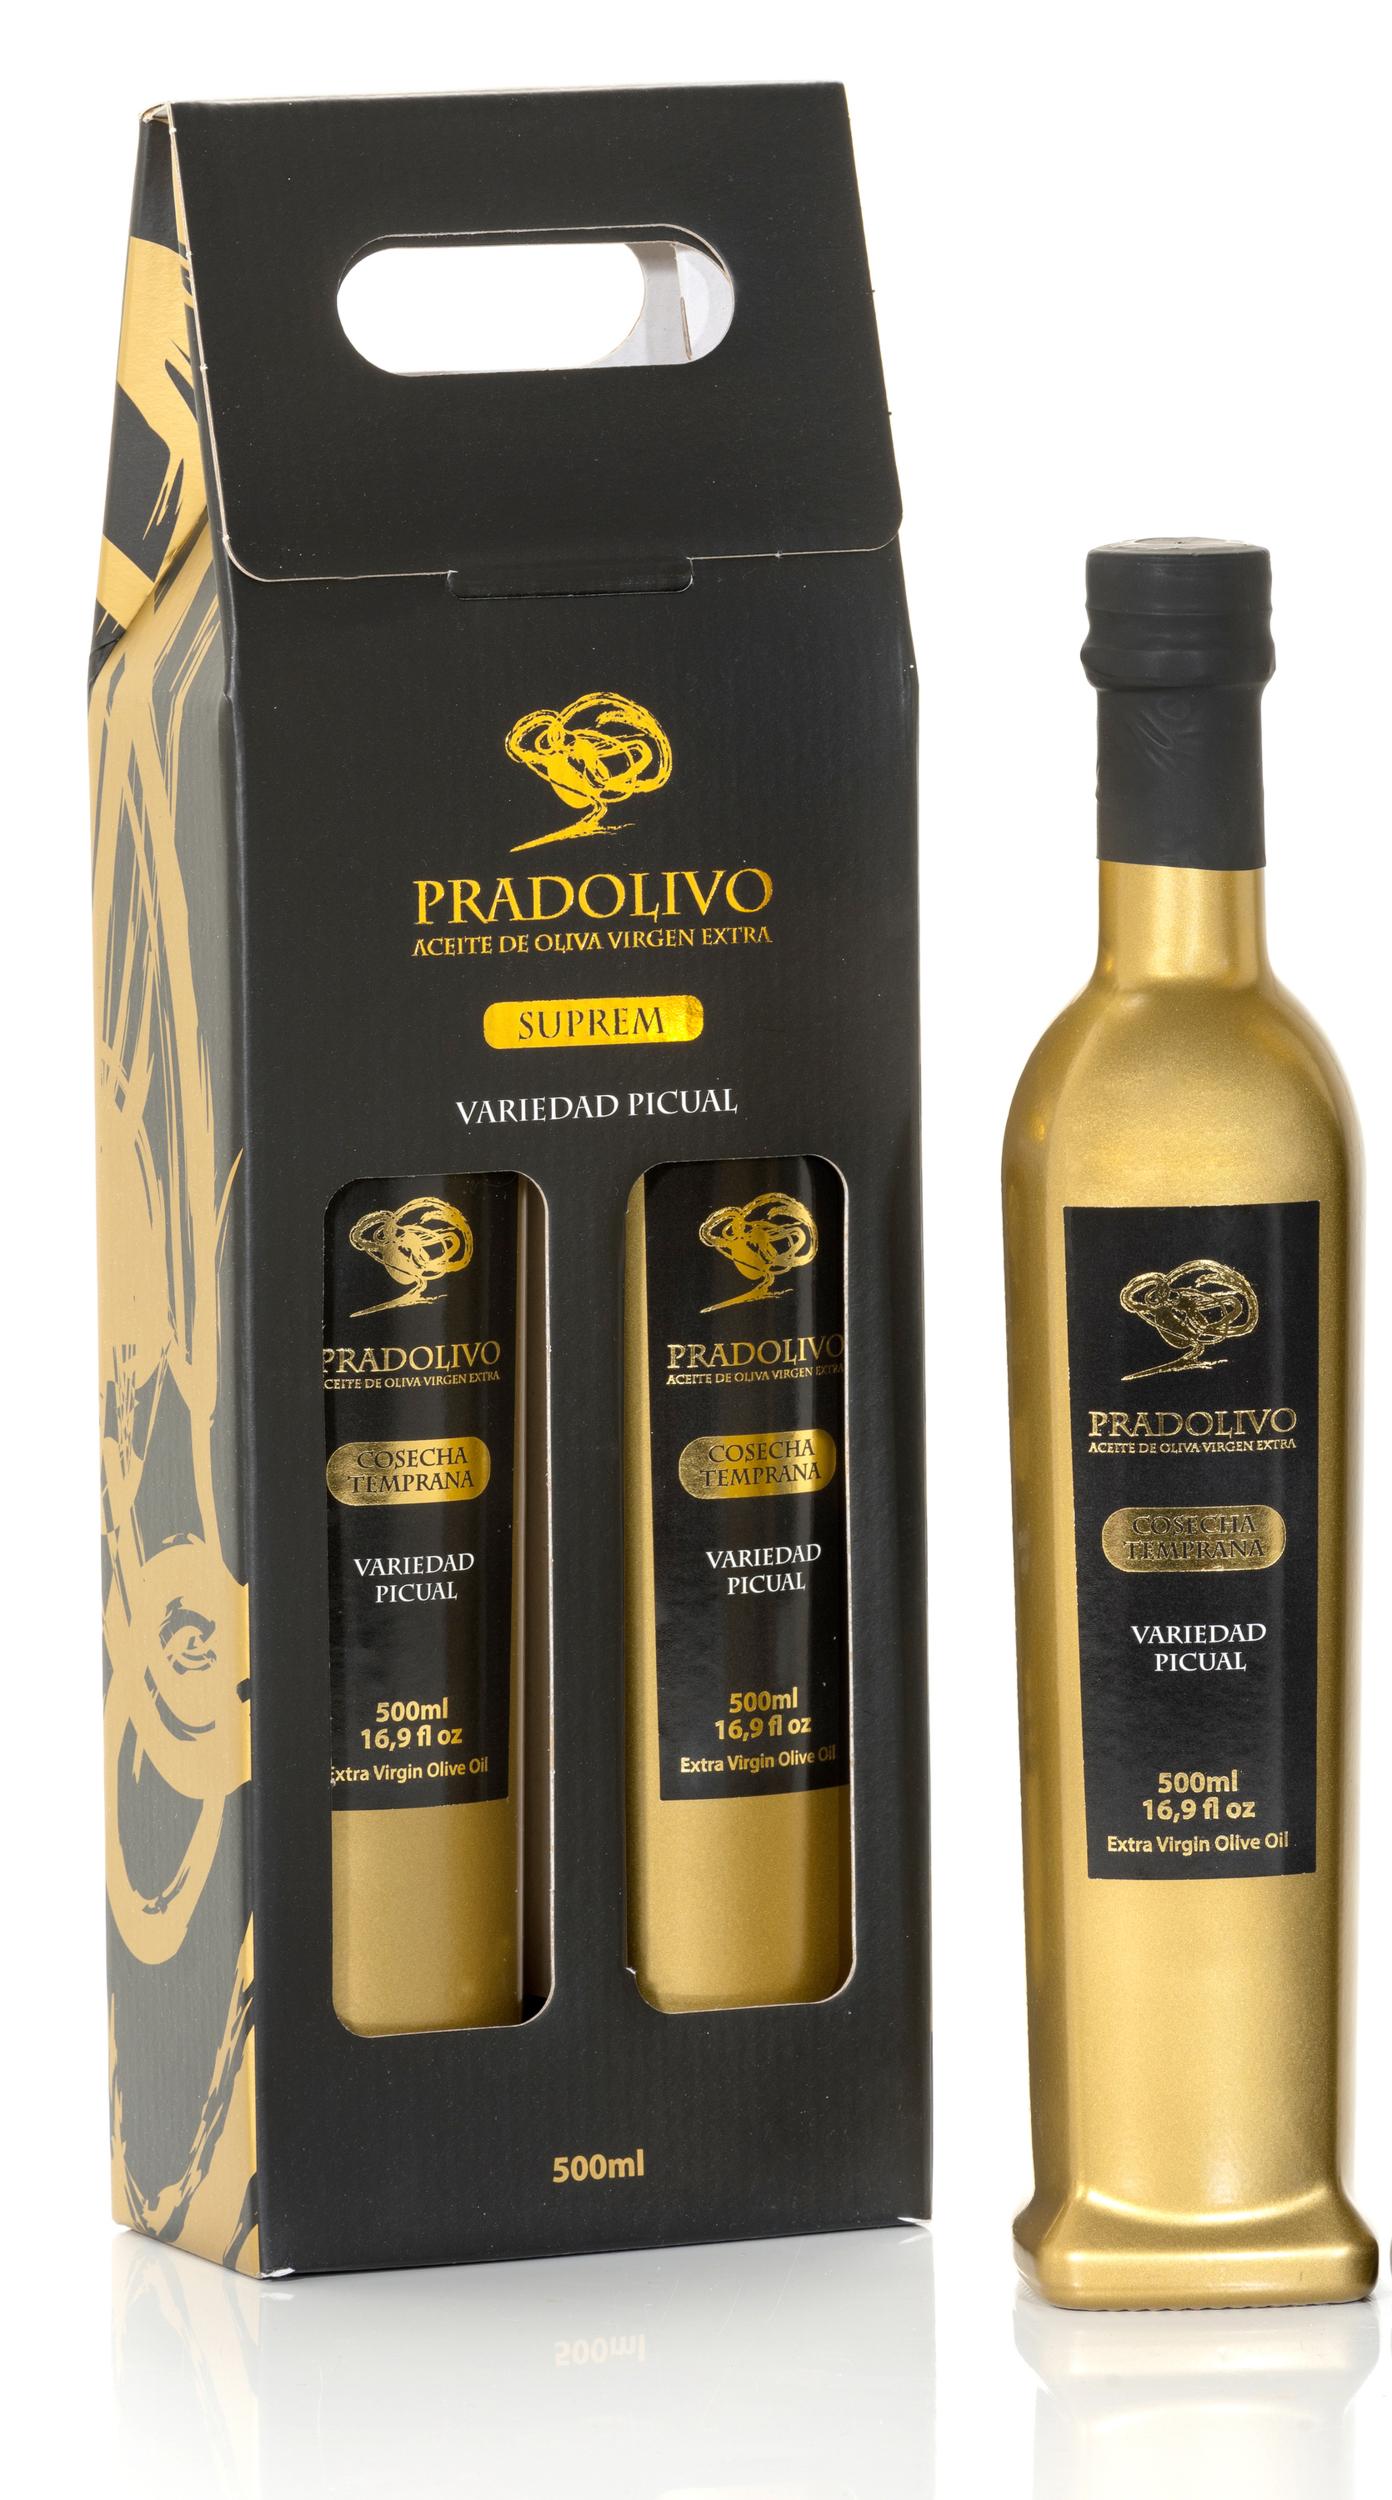 Pack Cadeau Huile d\' olive extra vierge Pradolivo Picual x 2 bouteilles de 500 ml